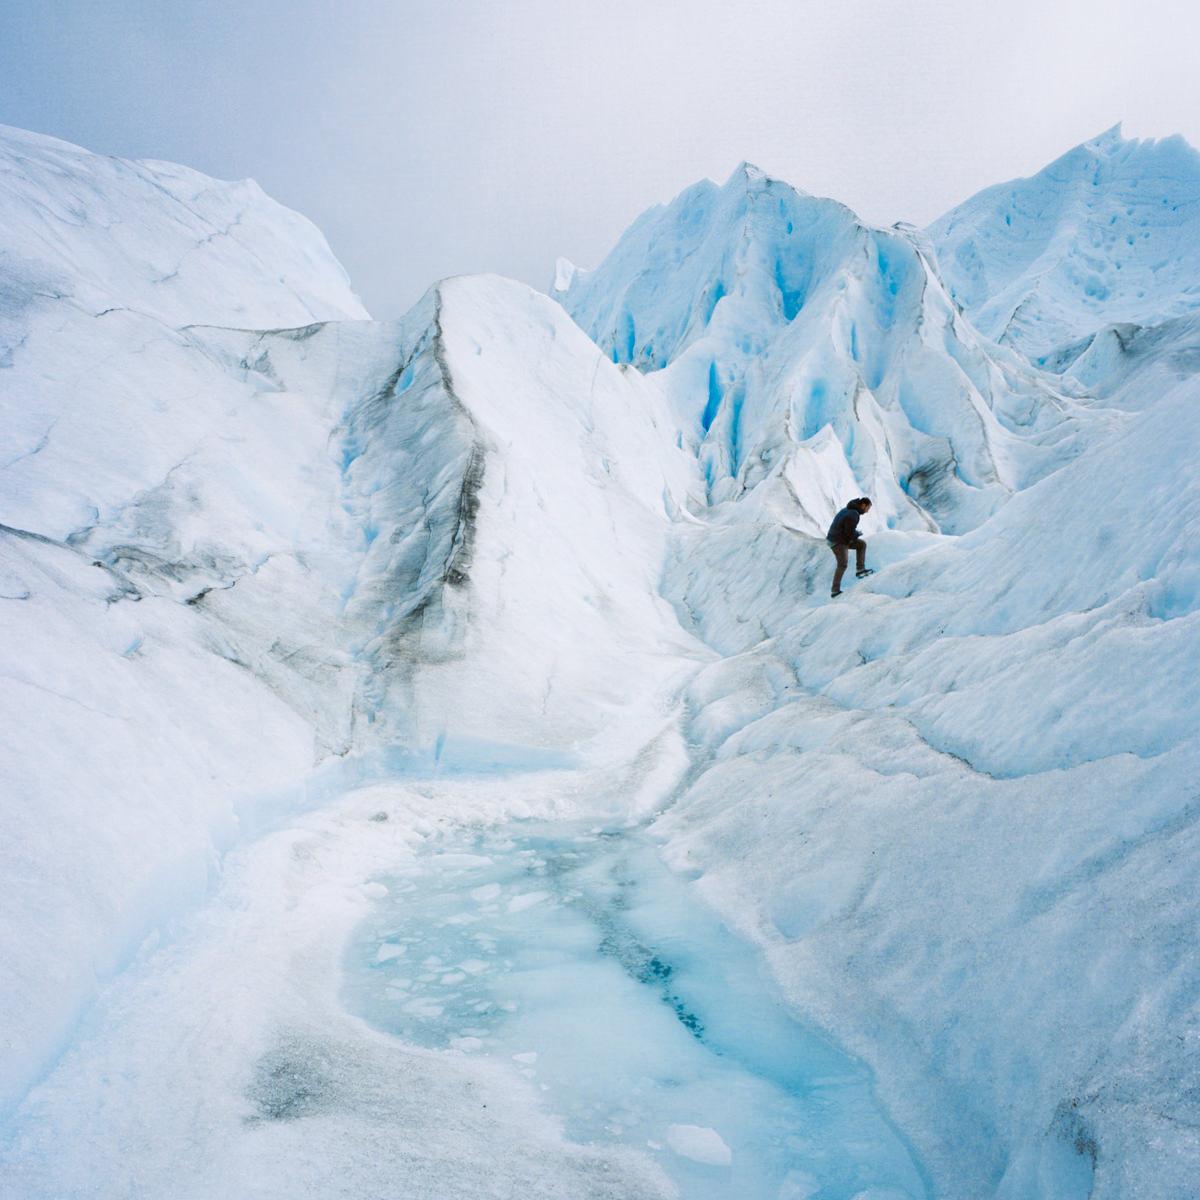 wrenee-patagonia-argentina-perito-moreno-trekking-3.jpg